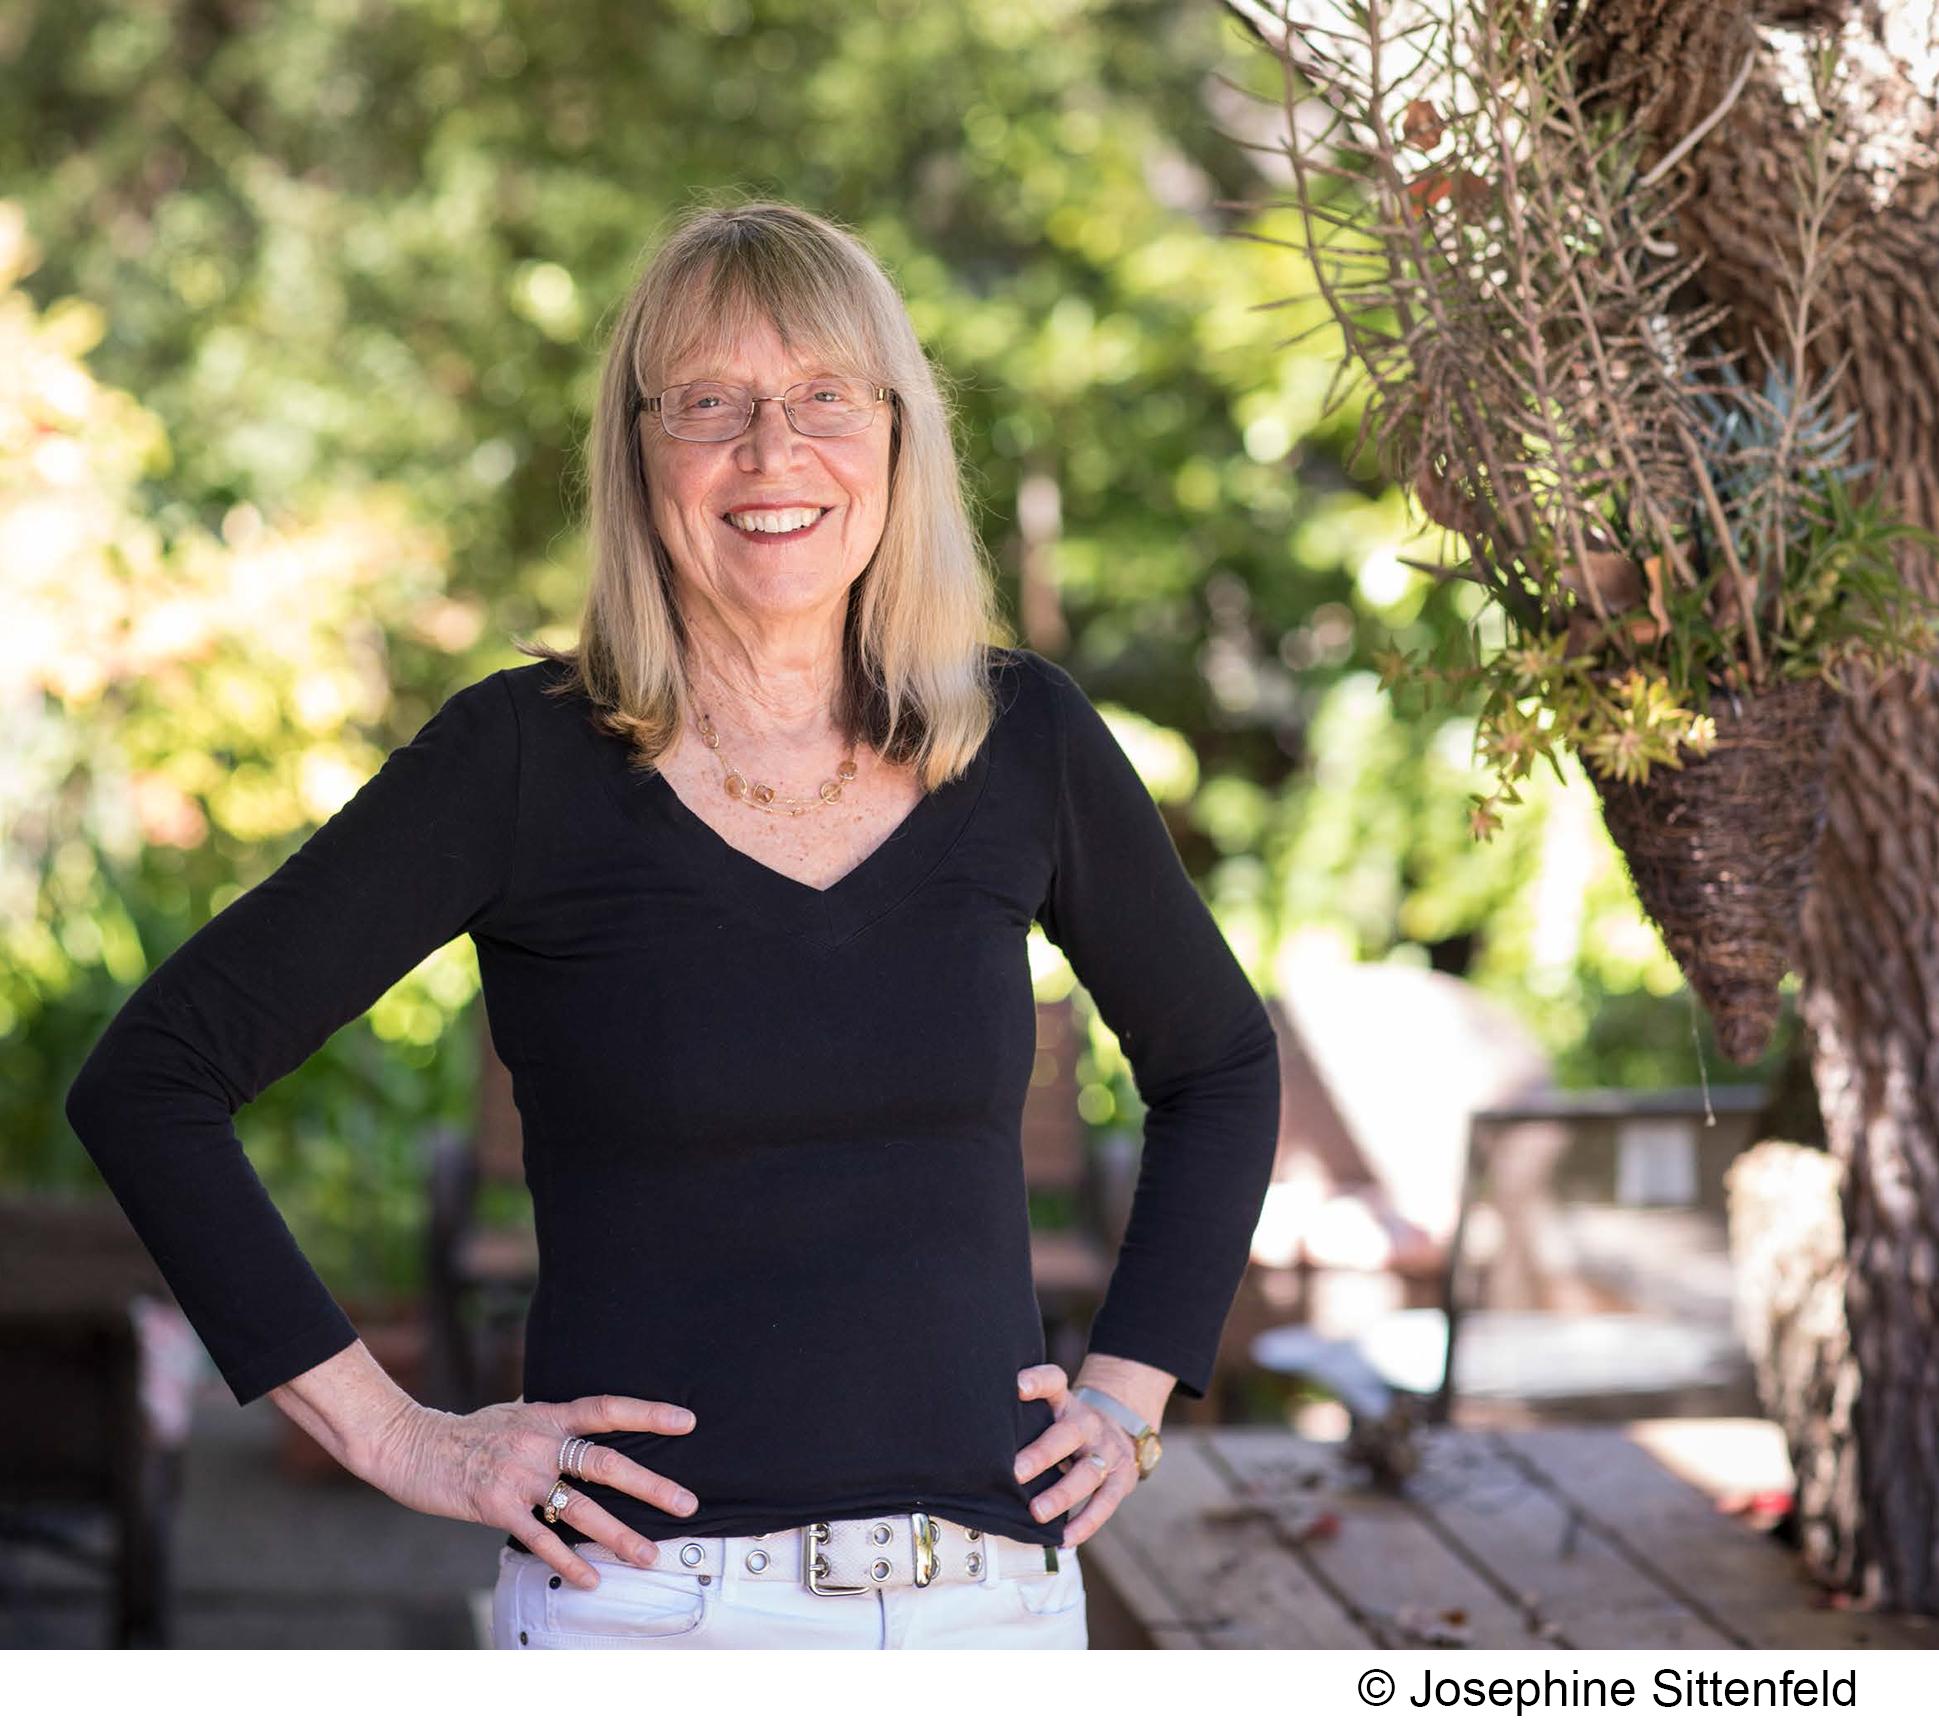 Esther Wojcicki Final Book author photo (1).jpg